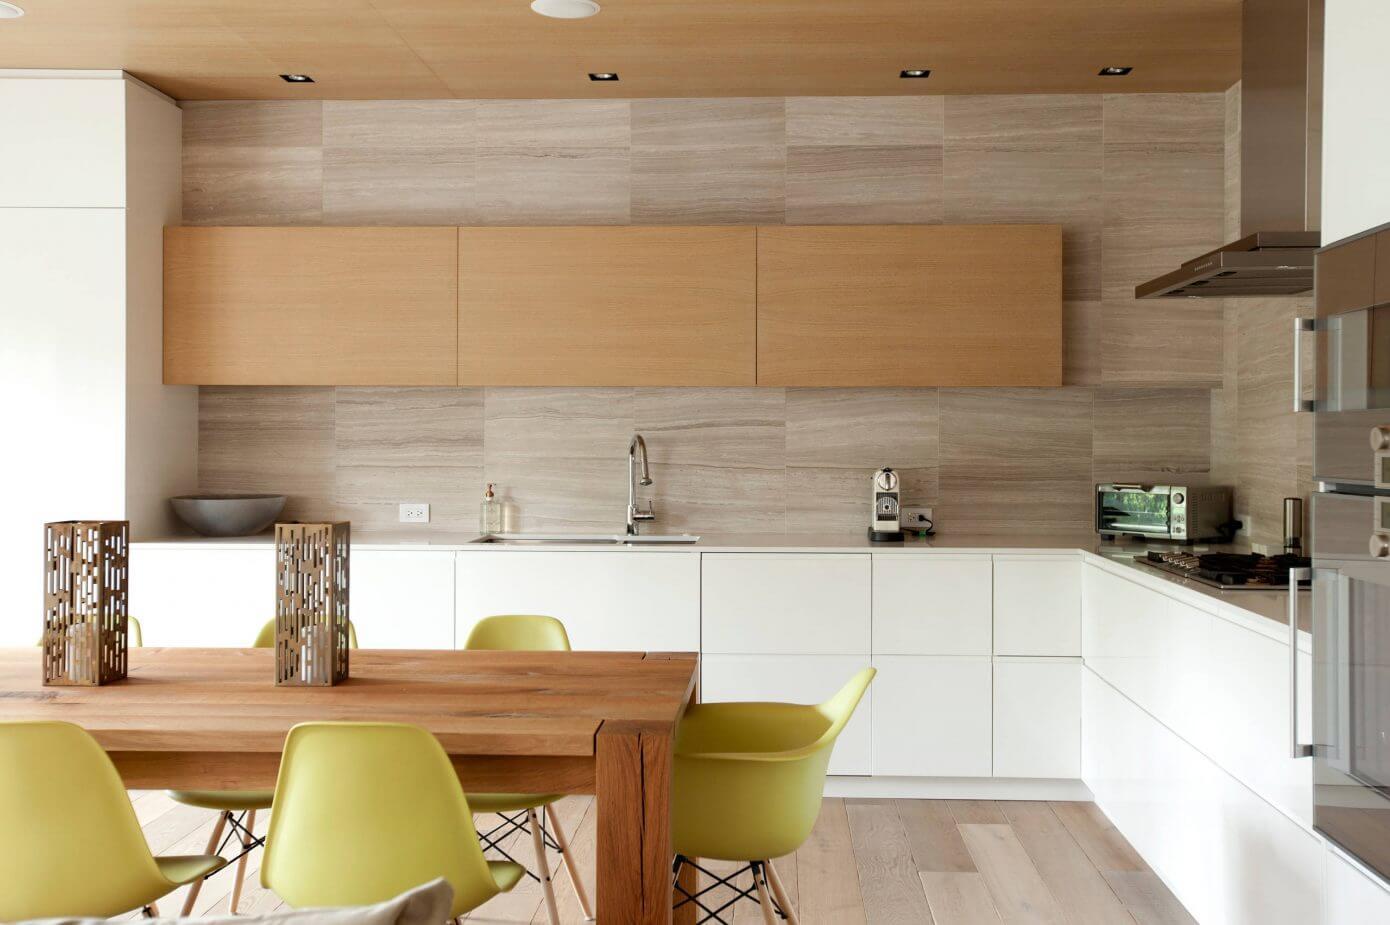 Shop Checkolite International 4 Light Ashfield Rustic: Whistler Residence By Evoke International Design